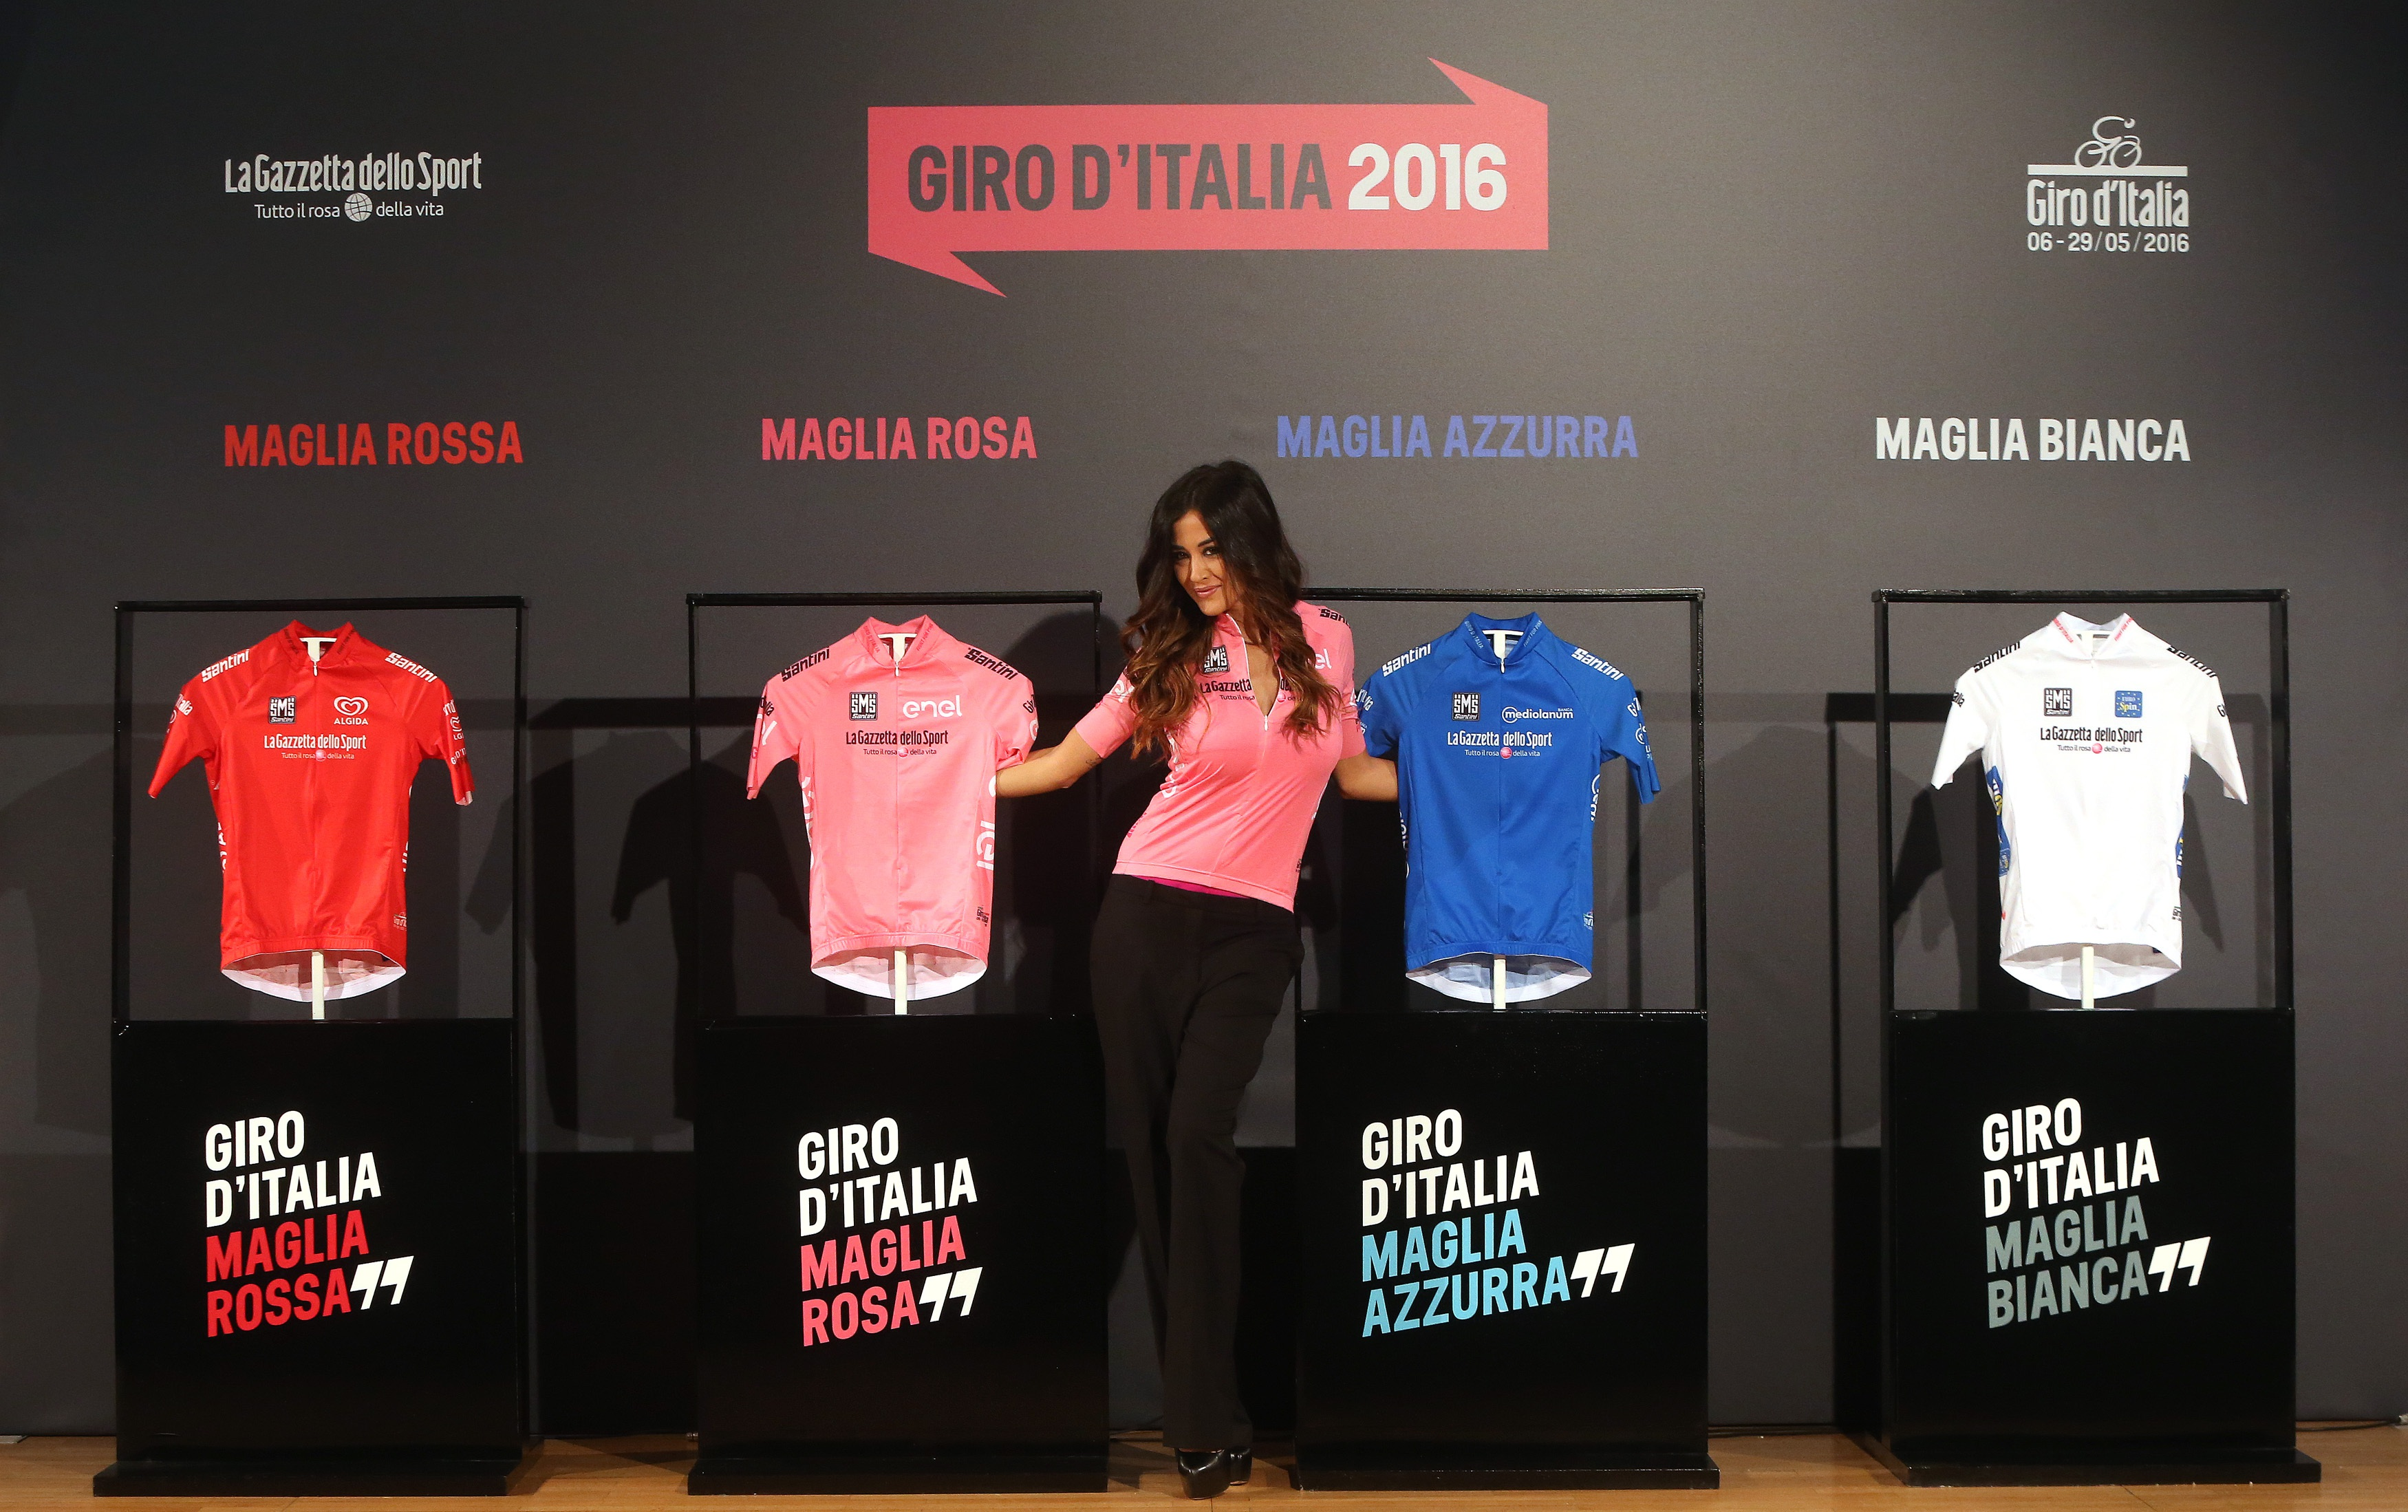 99^ GIRO D'ITALIA: PRESENTATE A MILANO LE MAGLIE 2016 E LA NUOVA MADRINA, GIORGIA PALMAS